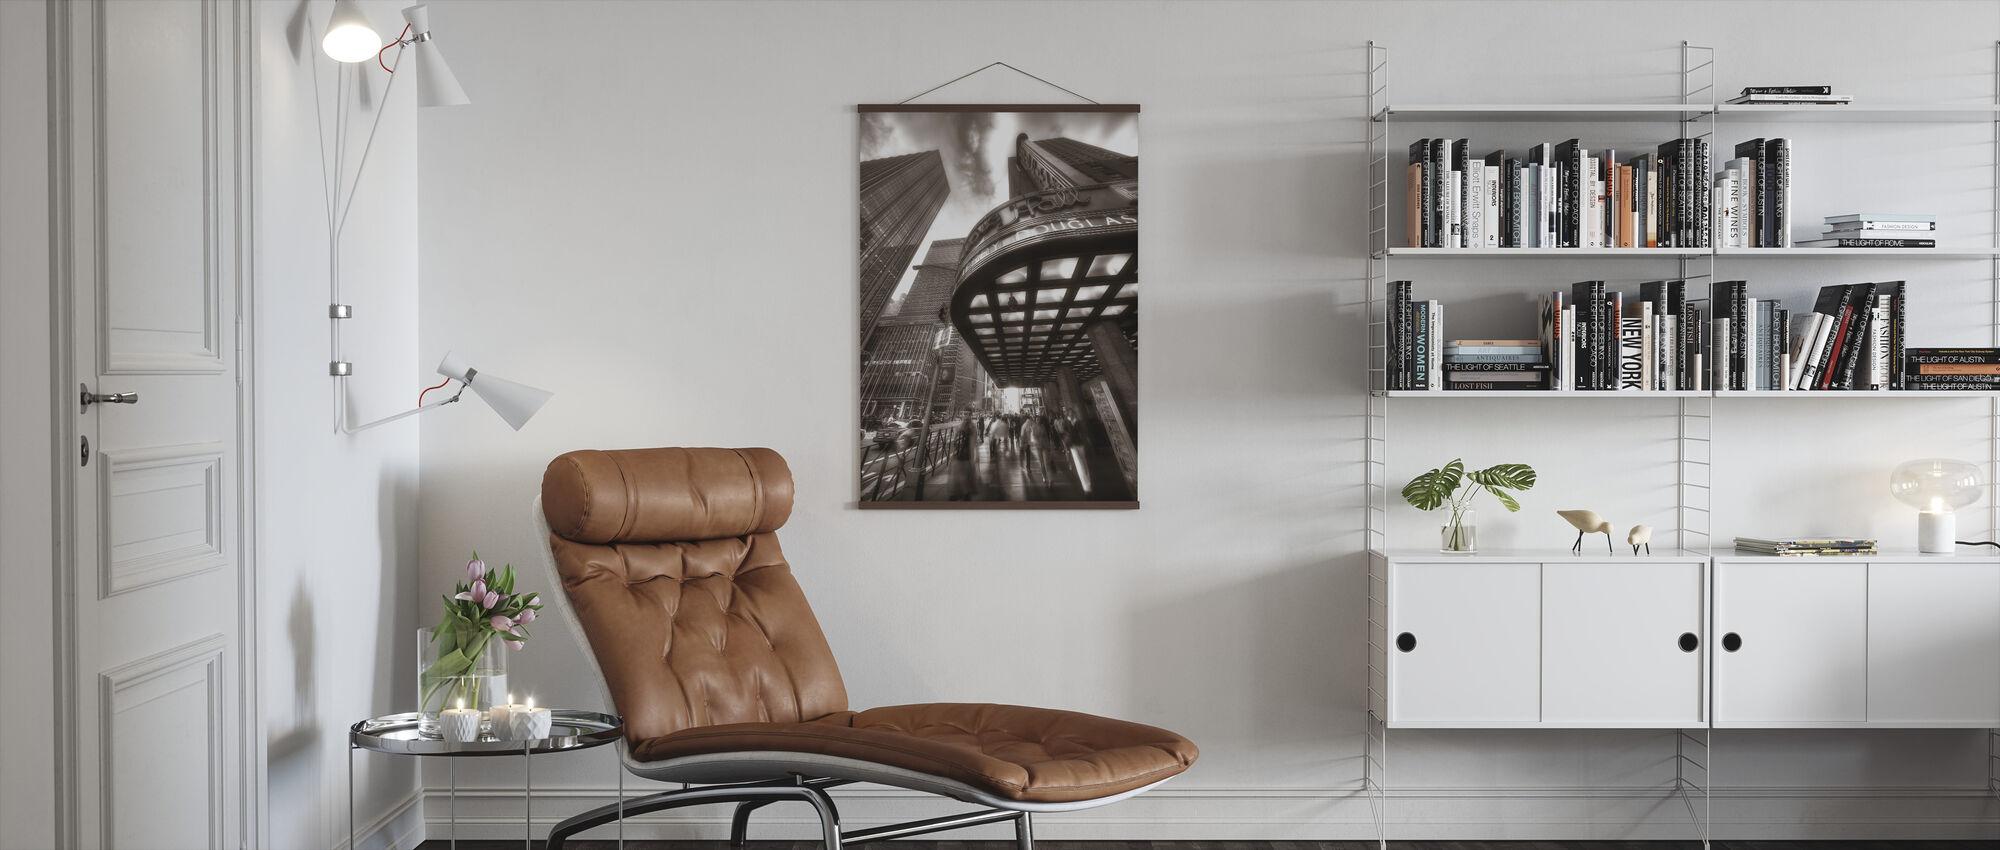 Radio City Hall, Manhattan, New York - Poster - Living Room